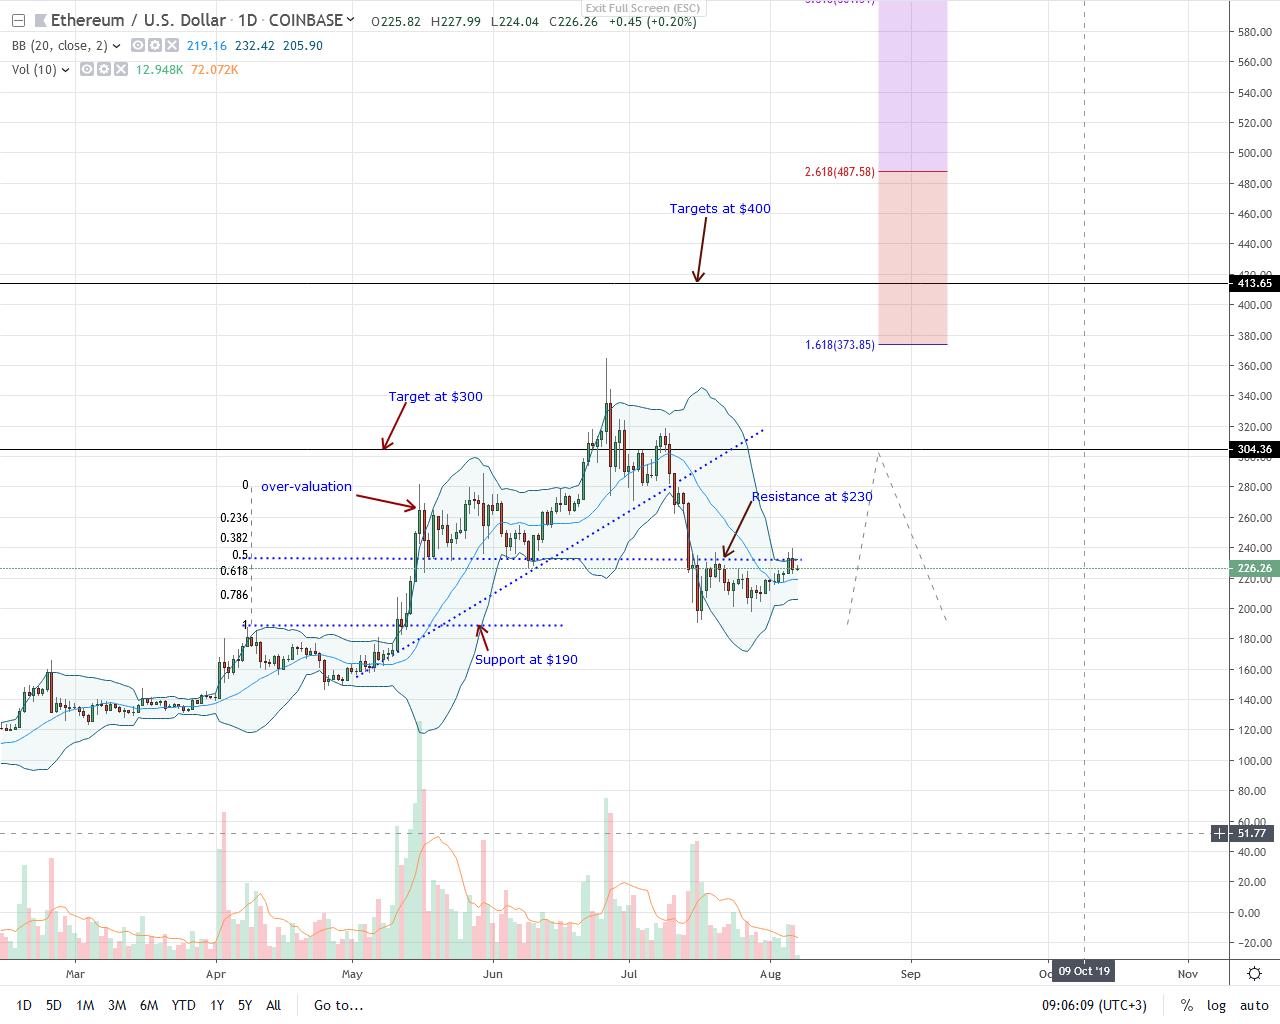 Ethereum USD Price